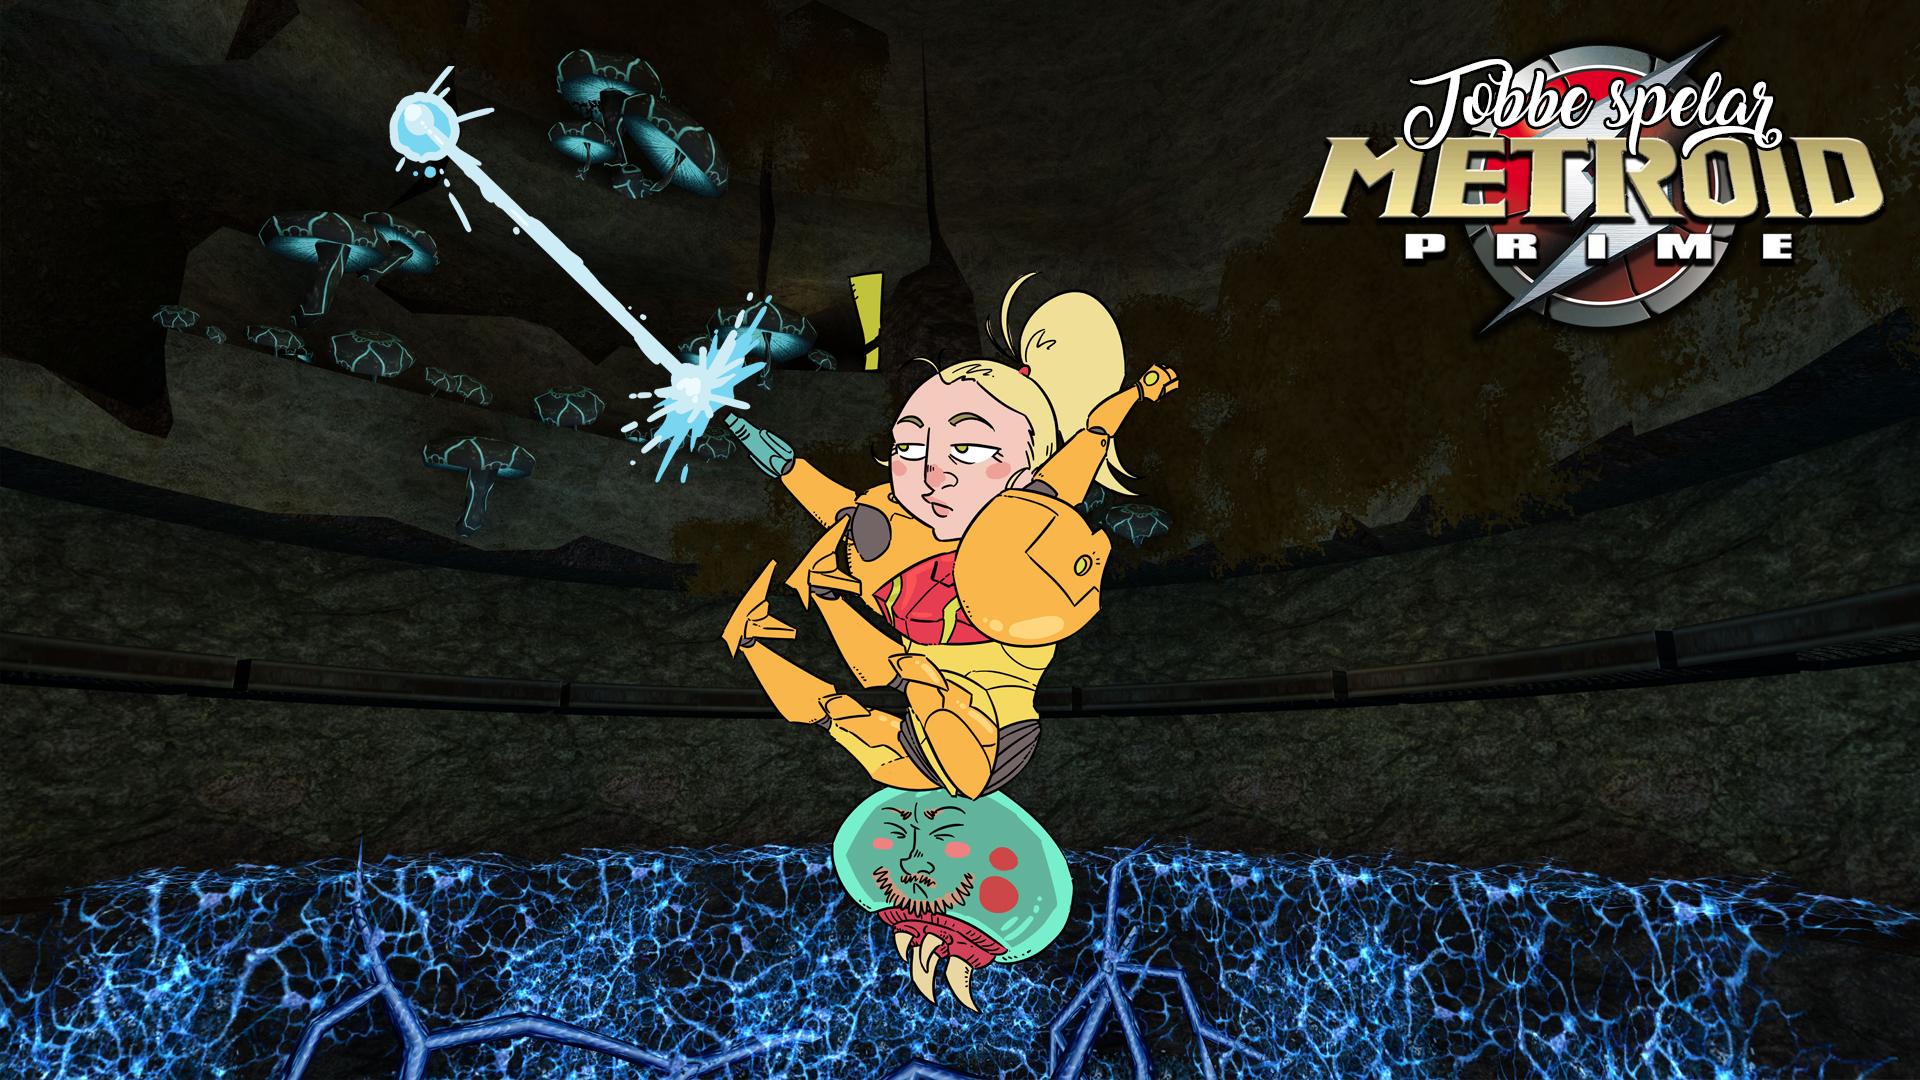 Tobbe spelar Metroid Prime, del 3